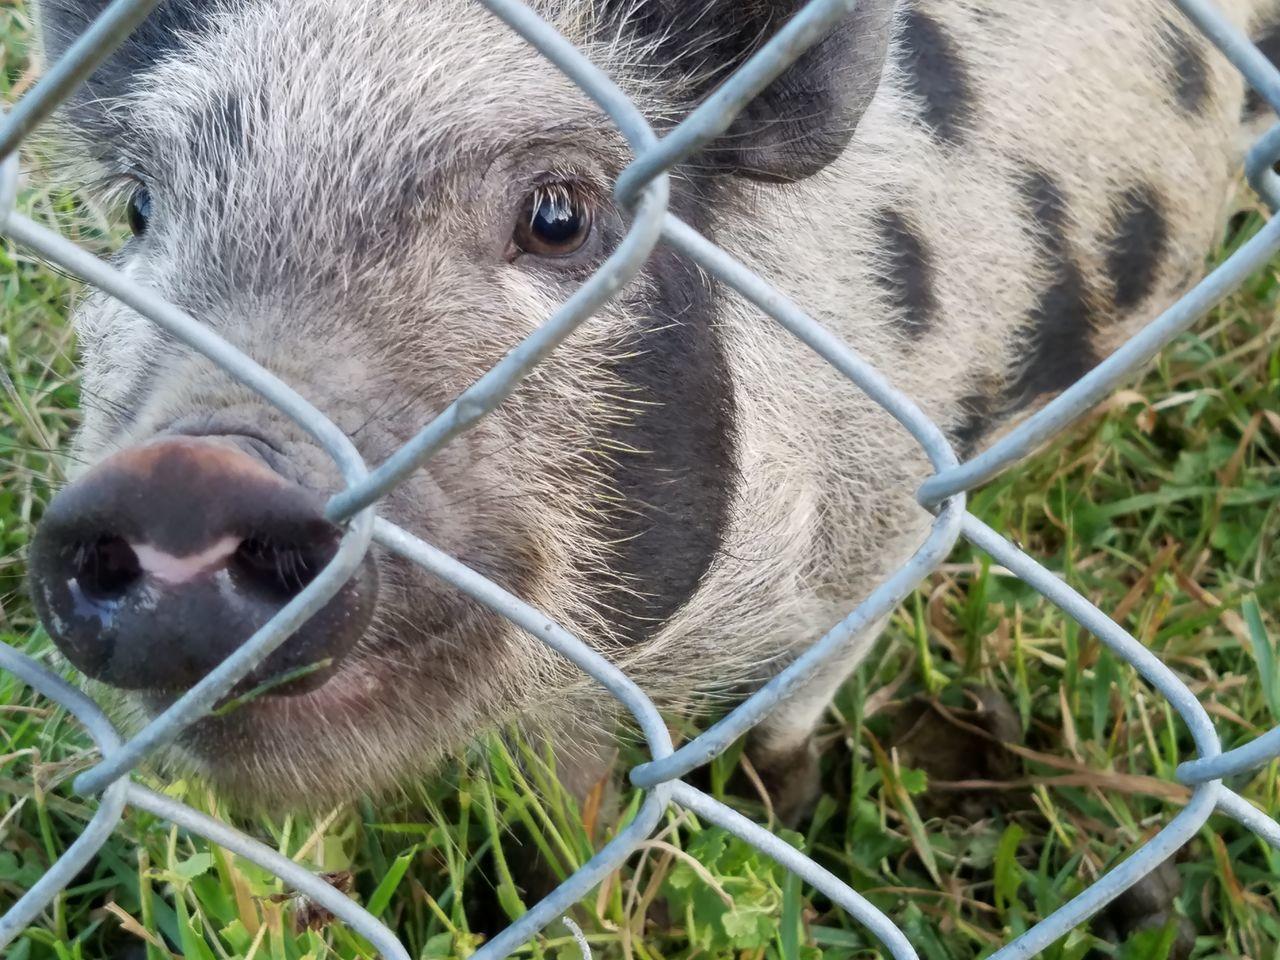 Kunekune Pig Piggy Minipigs Close-up Pig Nose Pig Selfie Life On The Farm Homesteading Meat Pig Gilt Spots Spotted Pig Orange And Black Pig Wet Nose